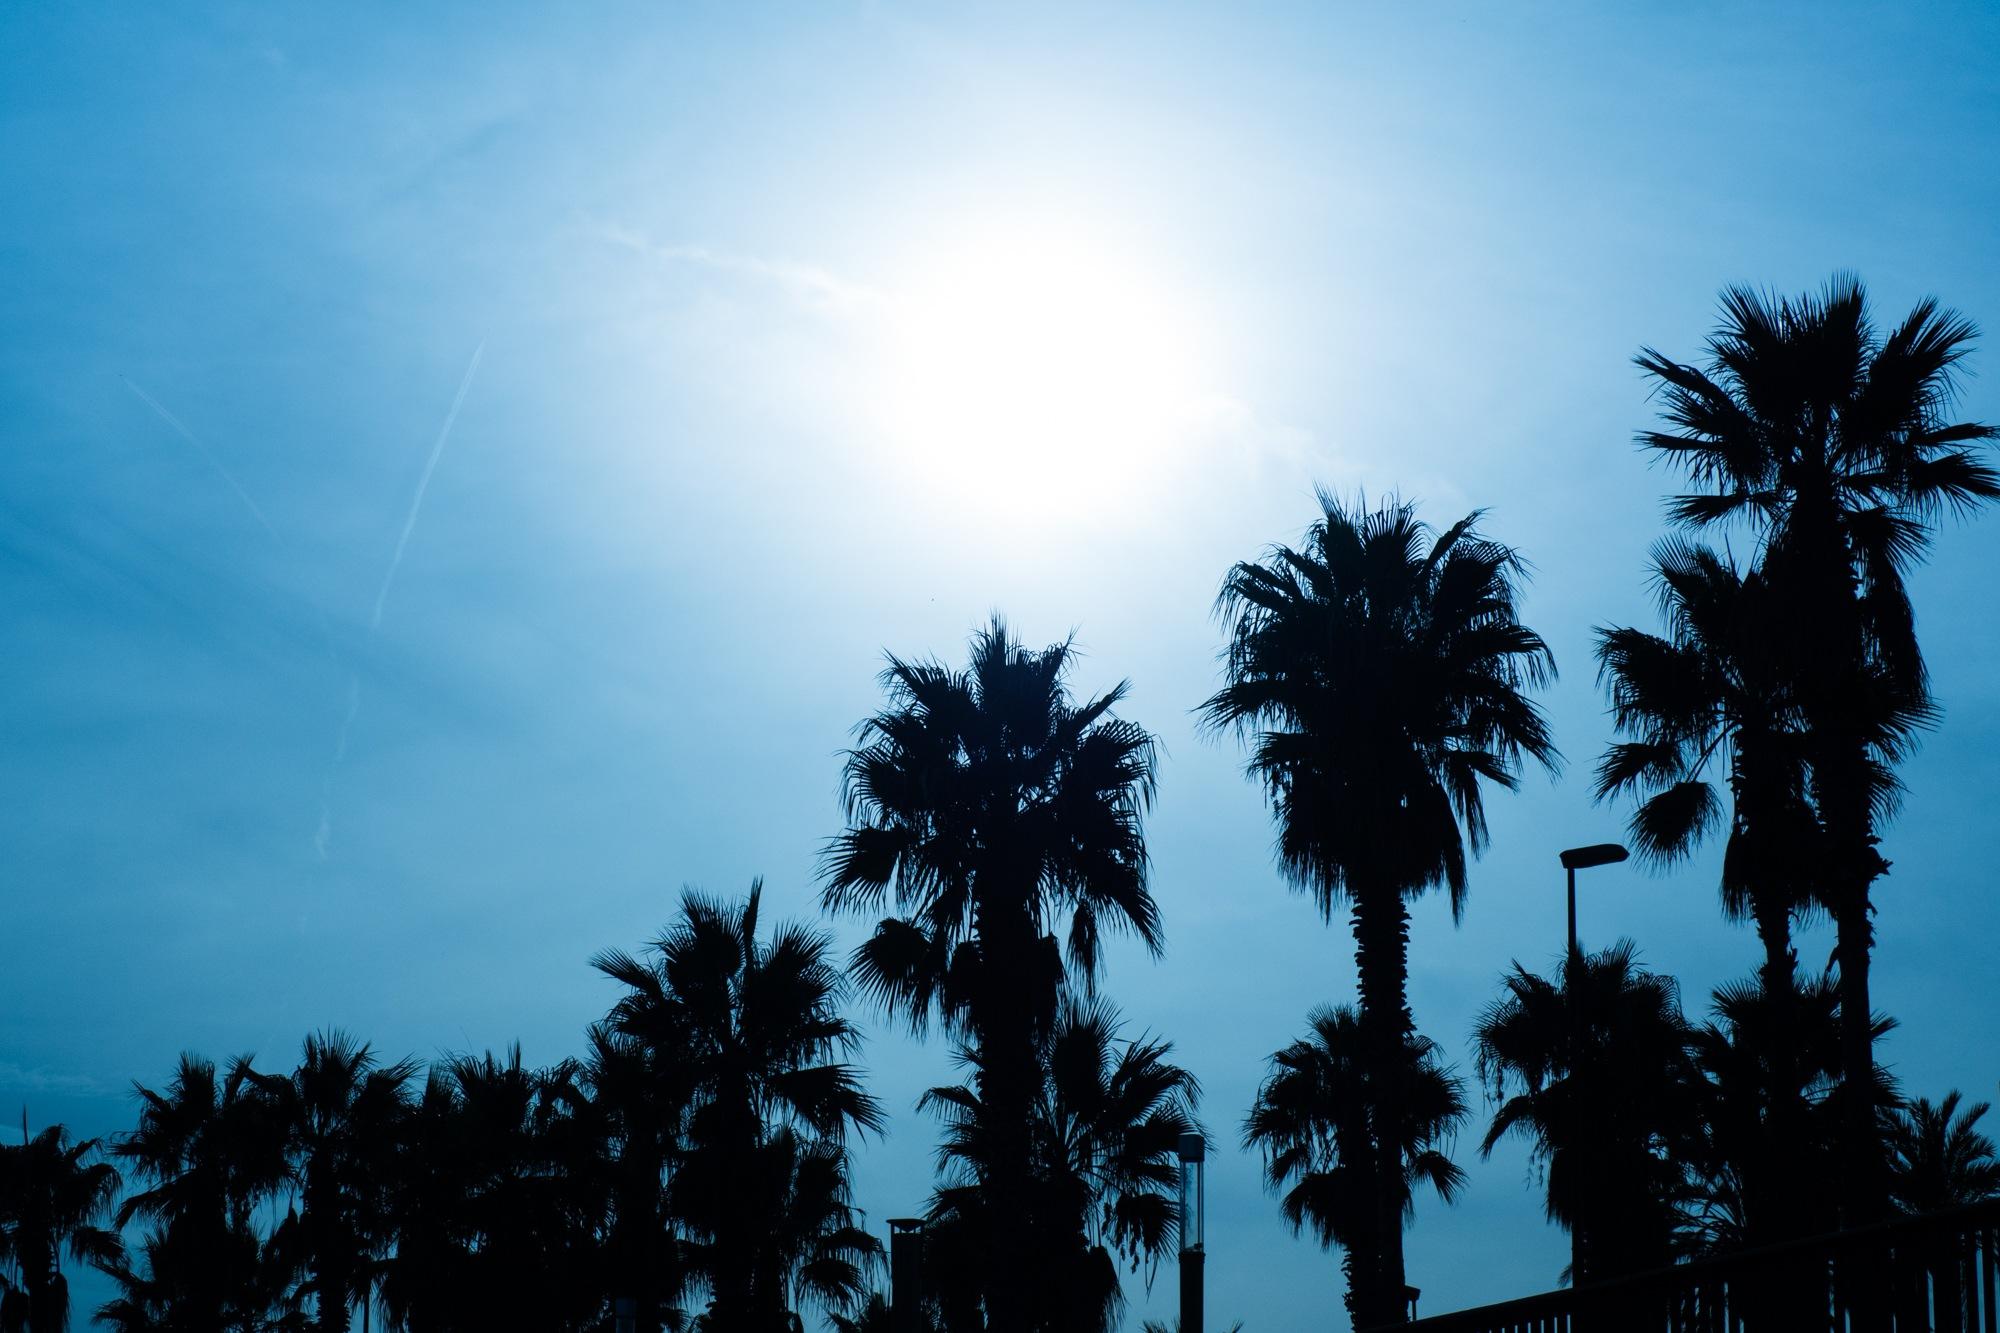 Sunny palm beach by DavidZisky